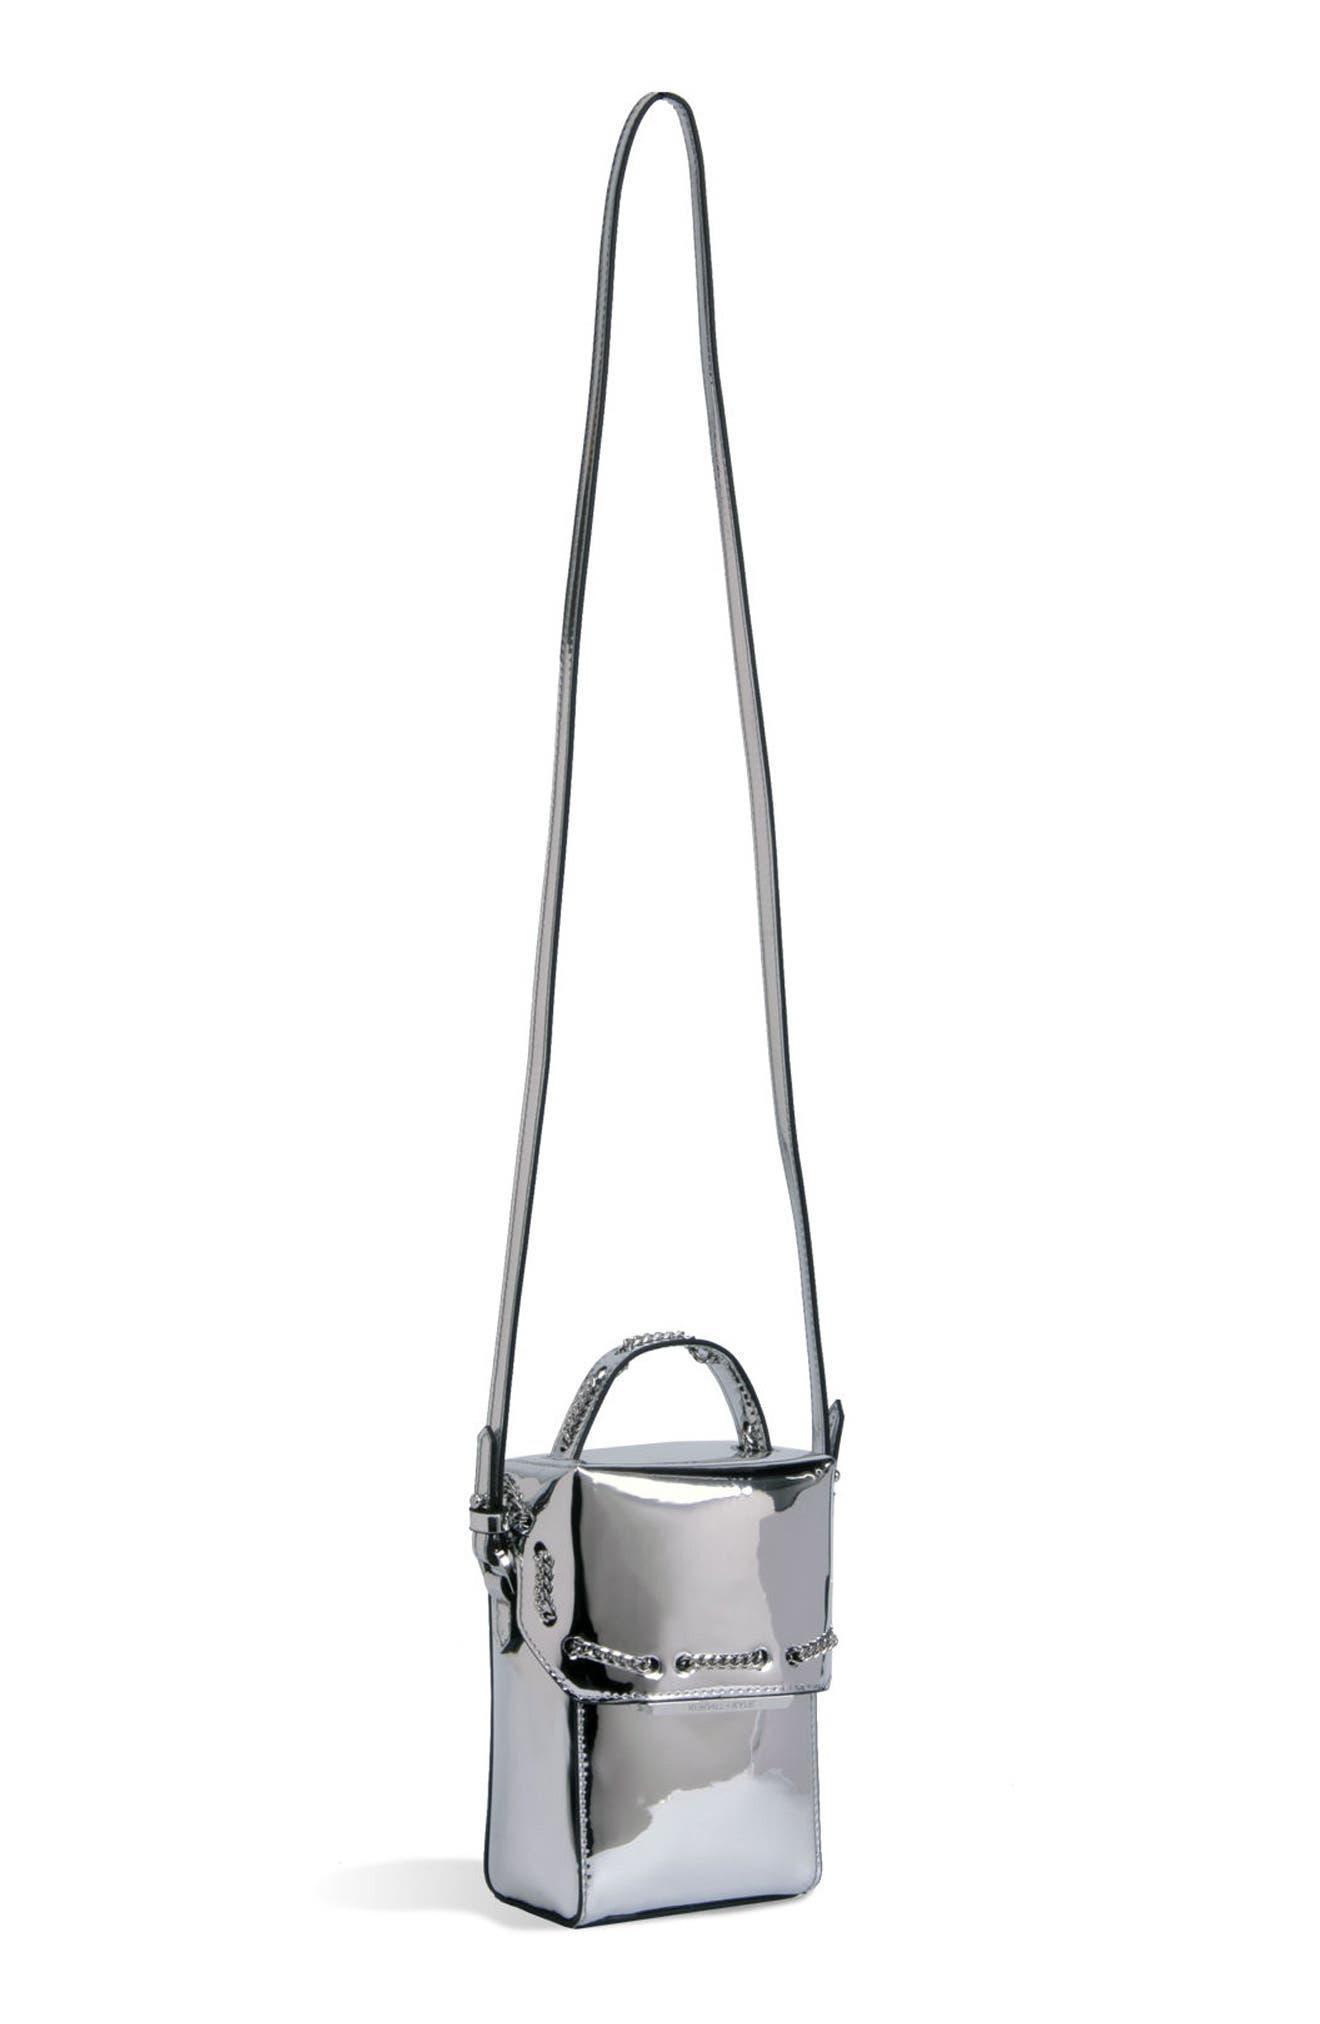 Alternate Image 1 Selected - KENDALL + KYLIE Ally Top Handle Crossbody Bag